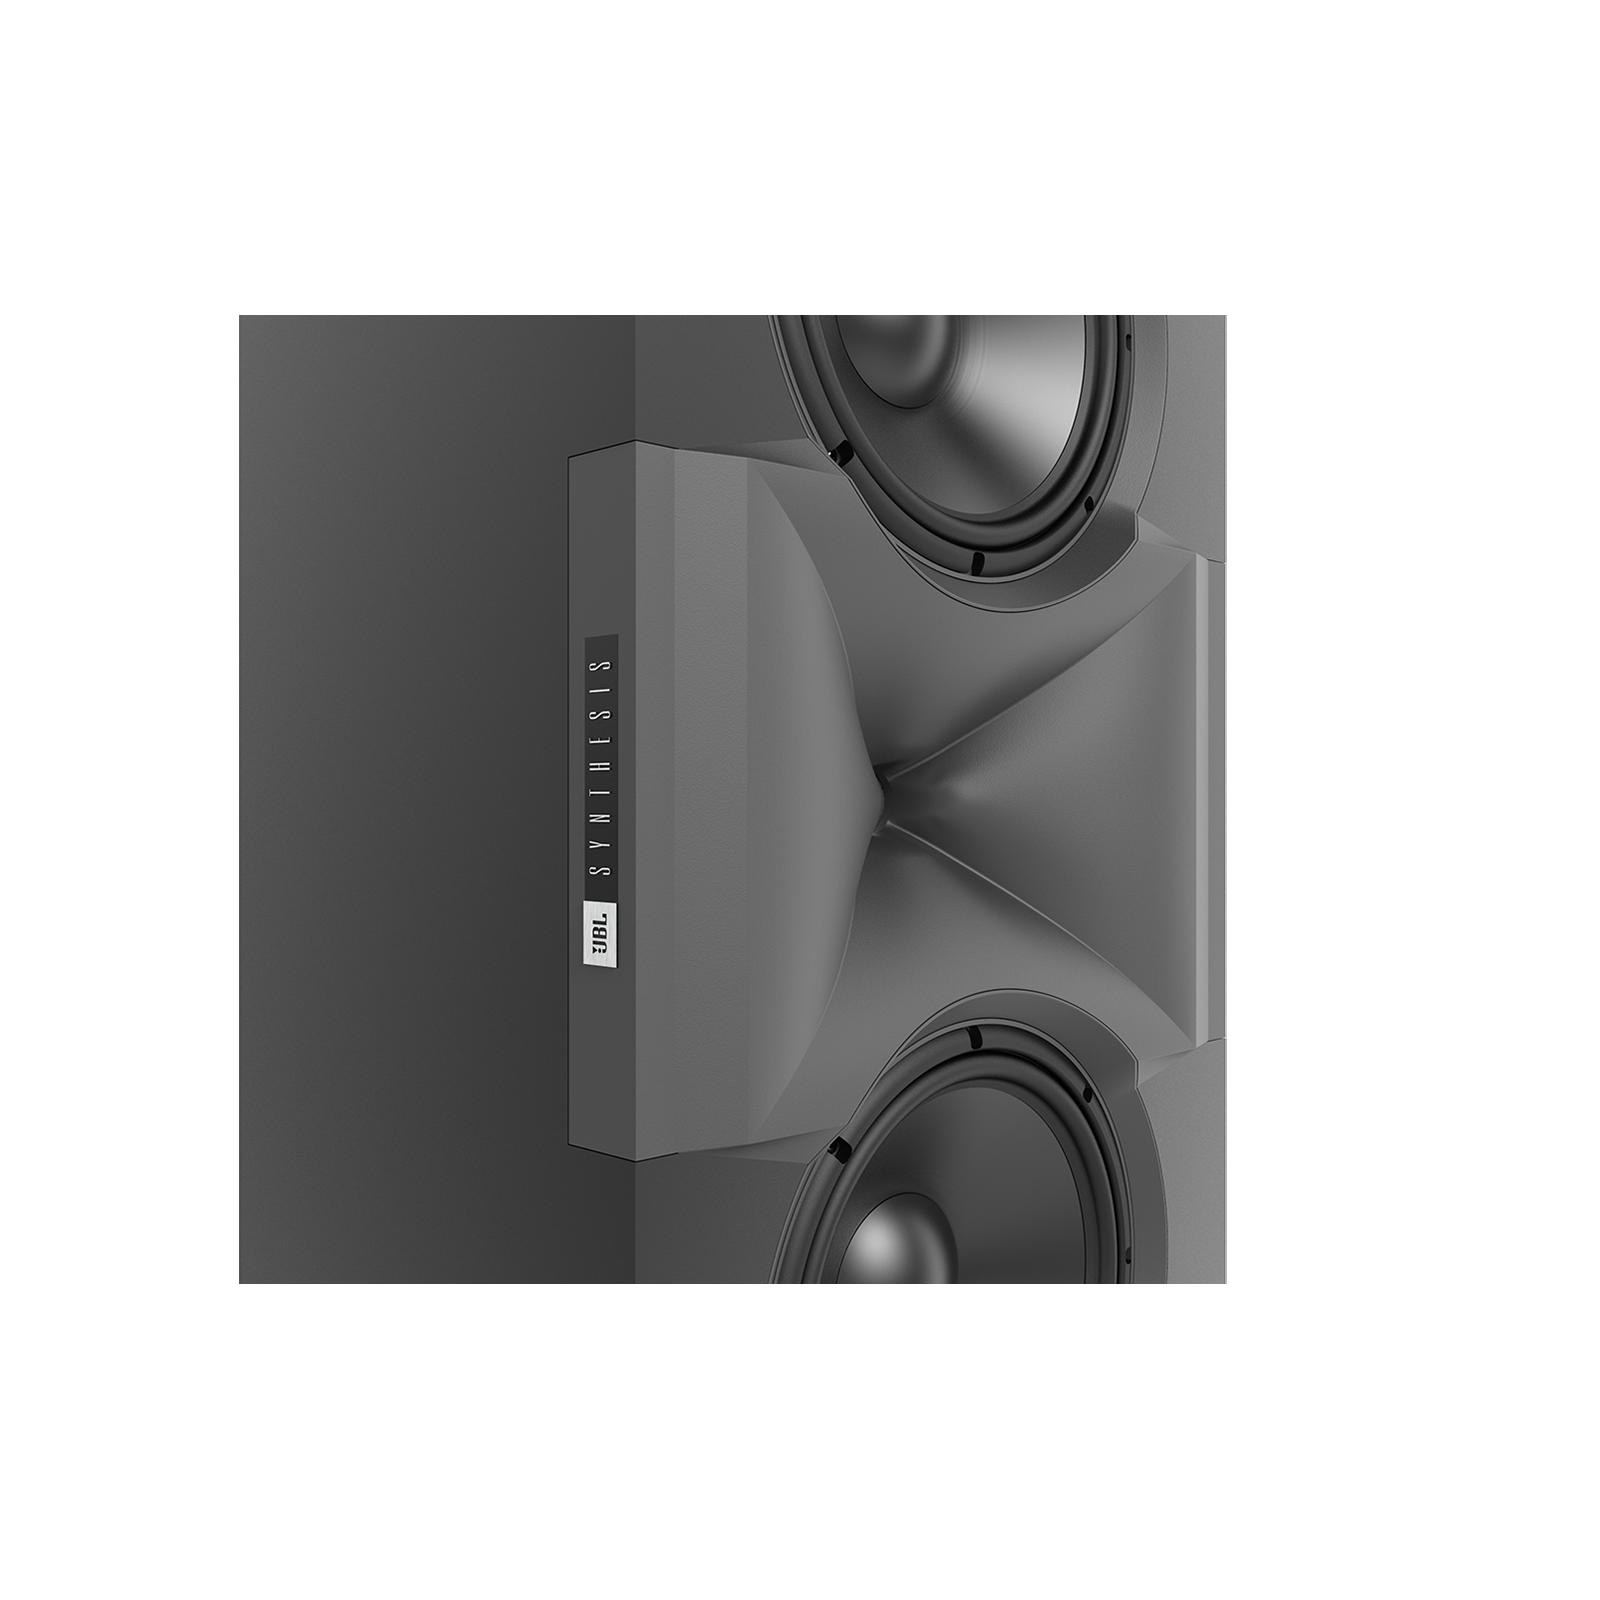 SCL-1 - Black - 2-Way Dual 12-inch (300mm) Custom LCR Loudspeaker - Detailshot 8